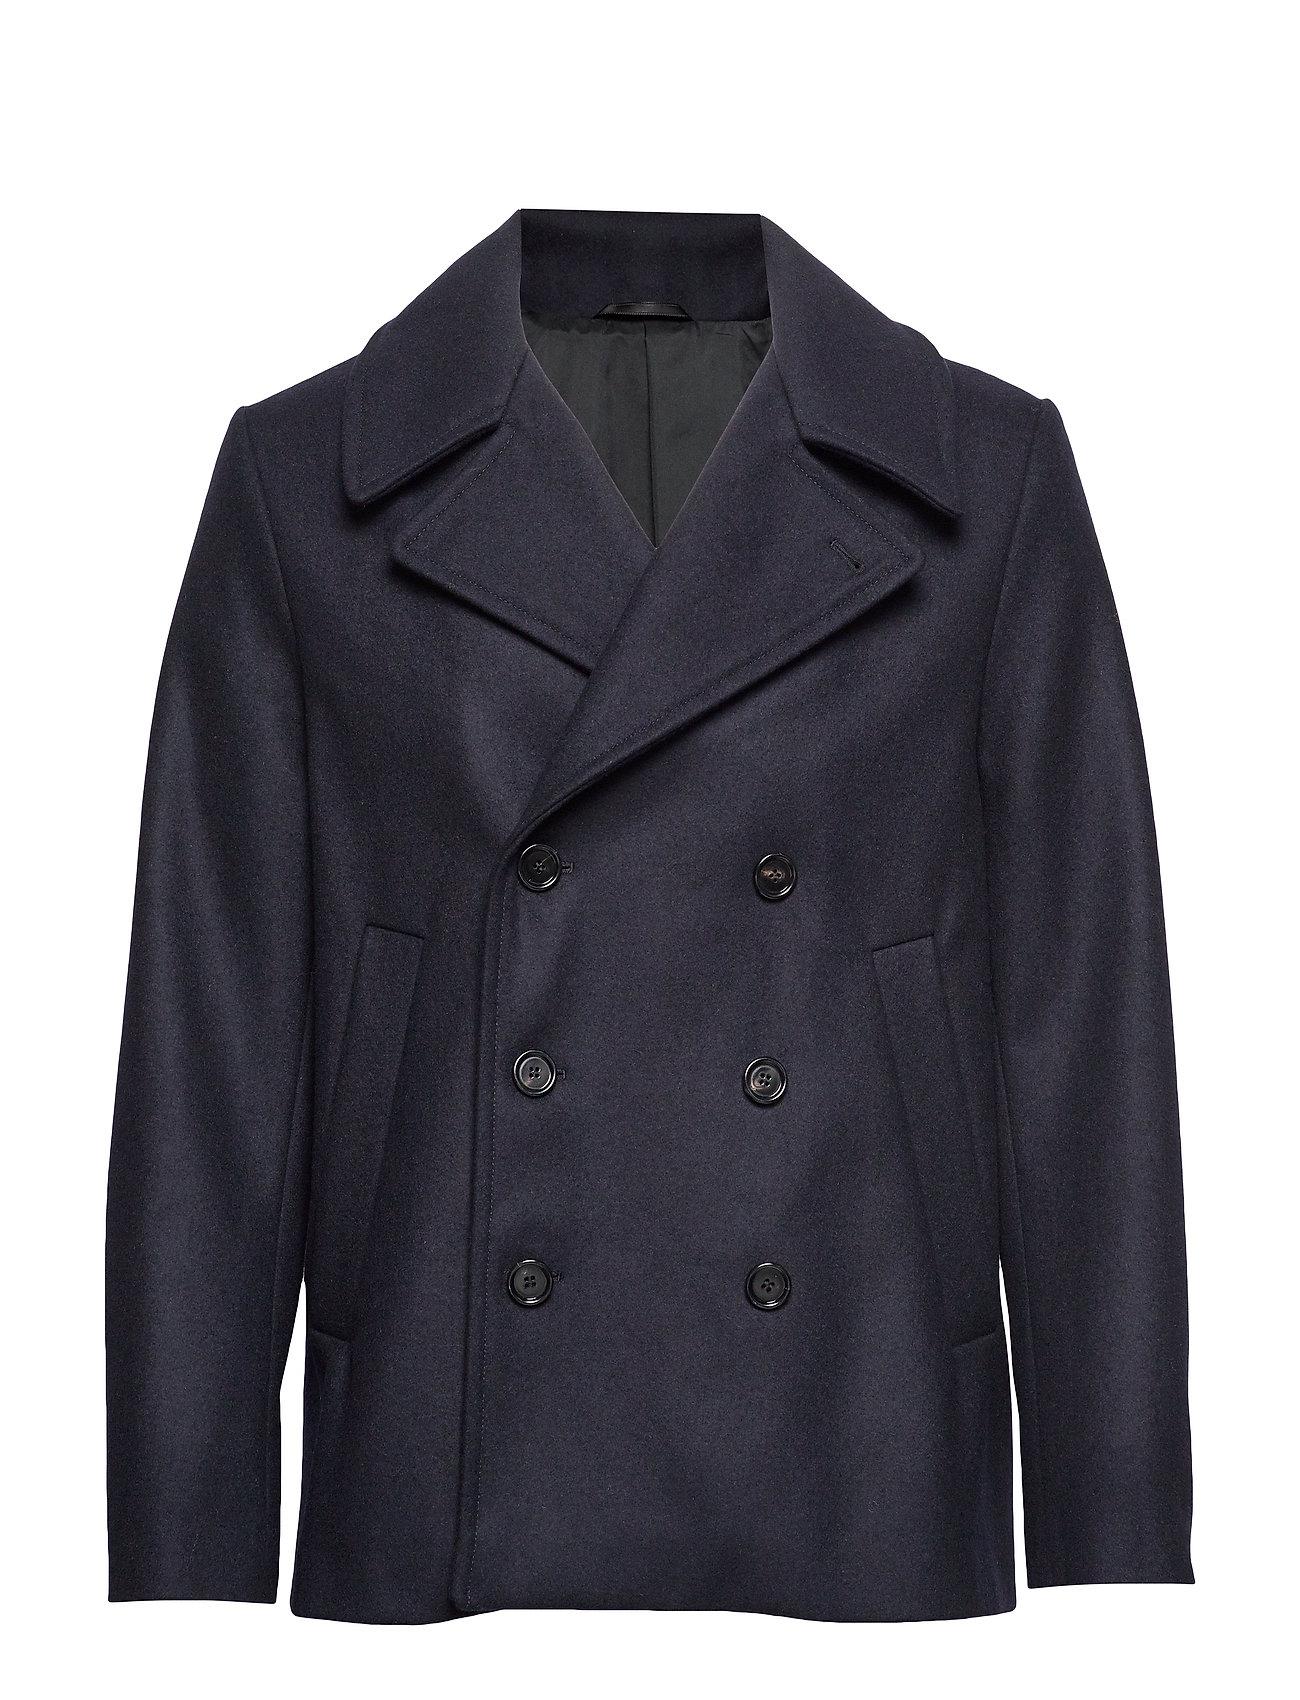 Filippa K M. Hague Pea Coat - BLUE BLACK